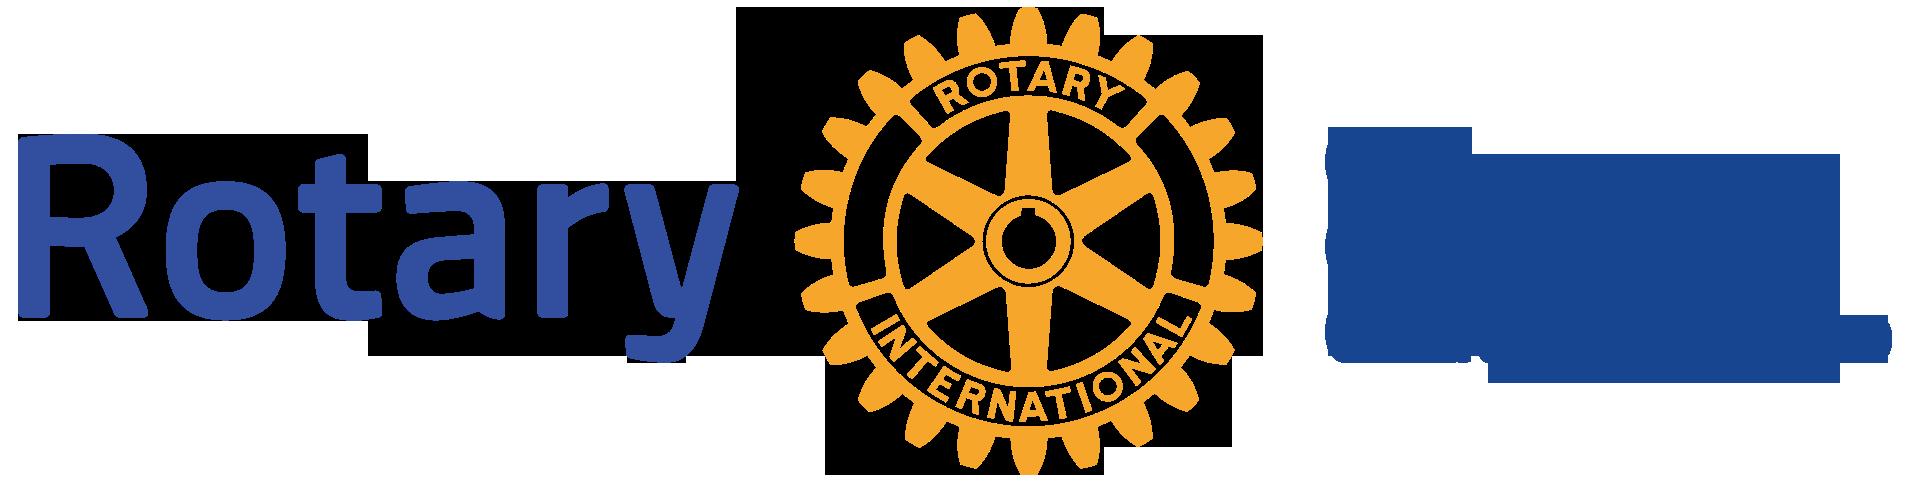 Rotary Club Orbetello Costa d'Argento